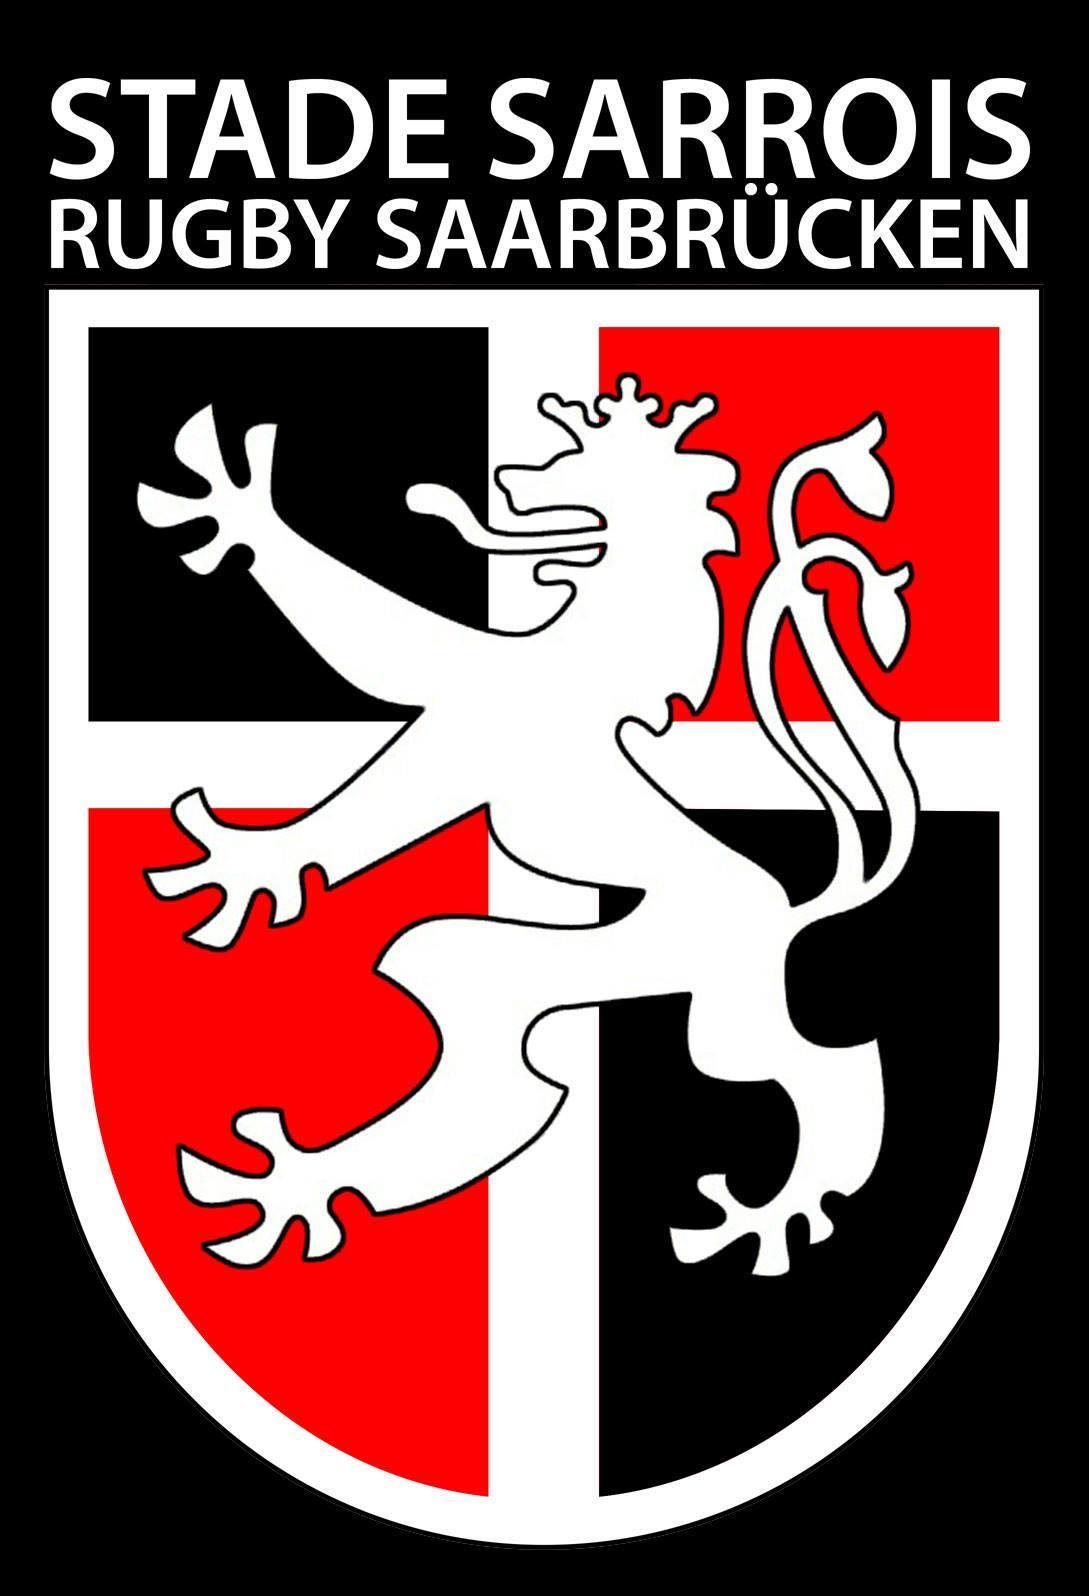 Rugby Saarbrücken